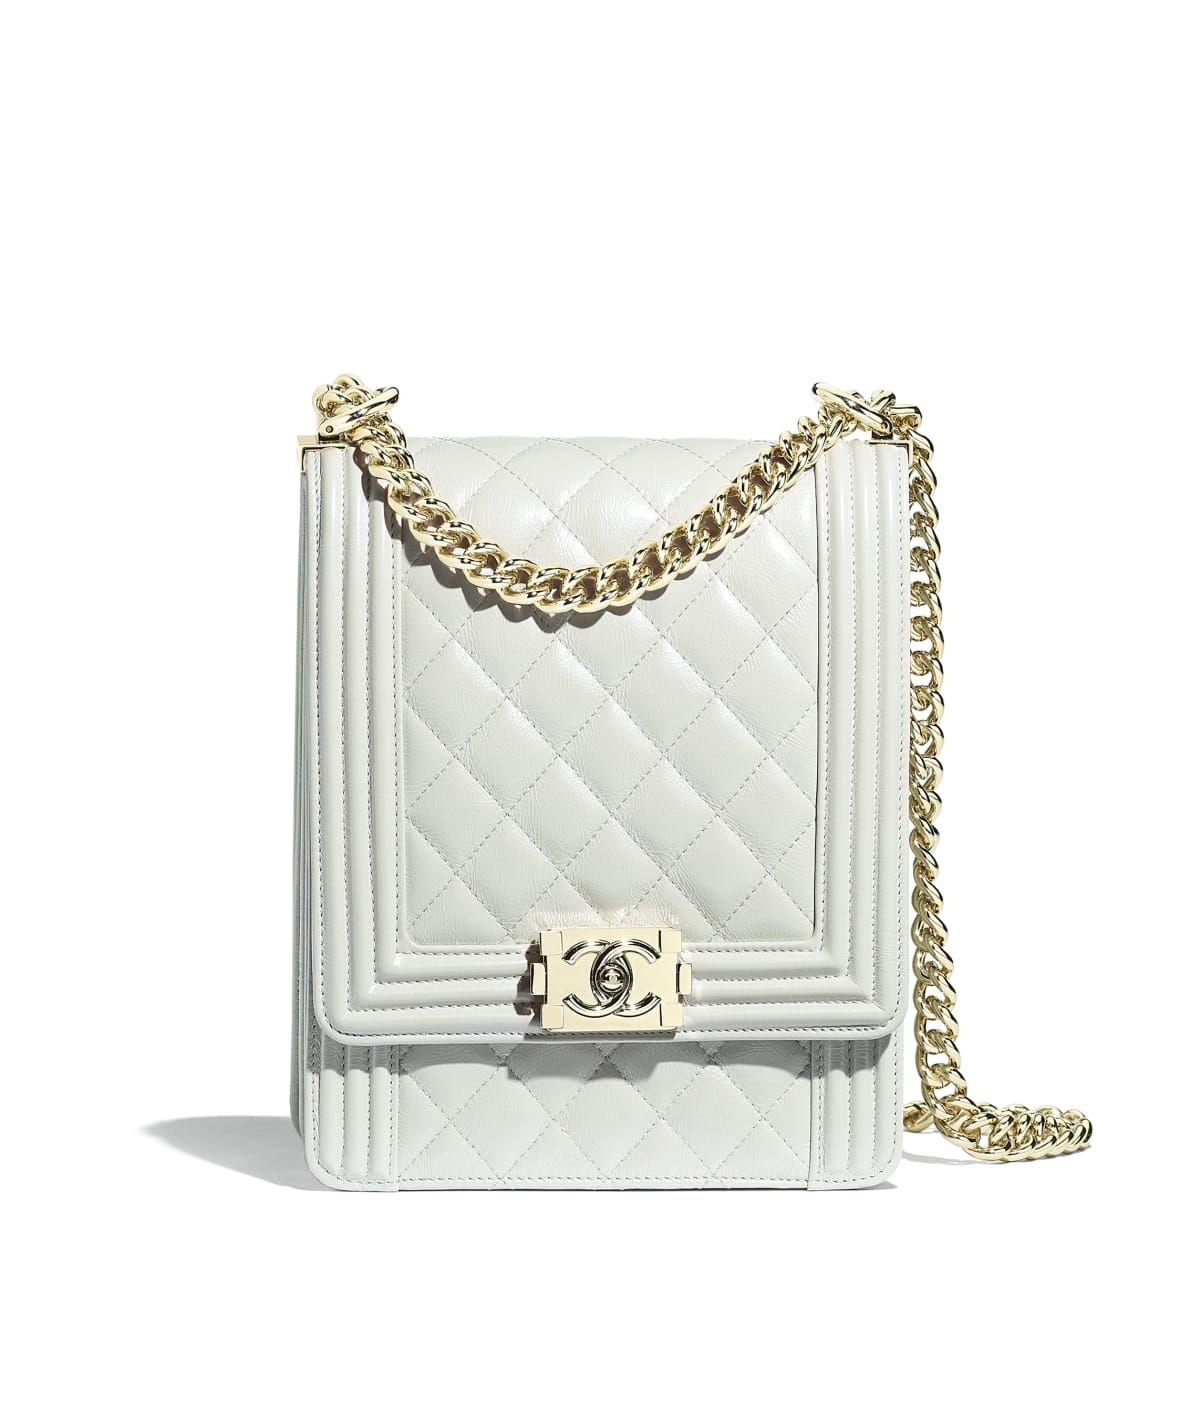 99f9d4a70a3a Handbags of the Spring-Summer 2019 CHANEL Fashion collection   BOY CHANEL  Handbag